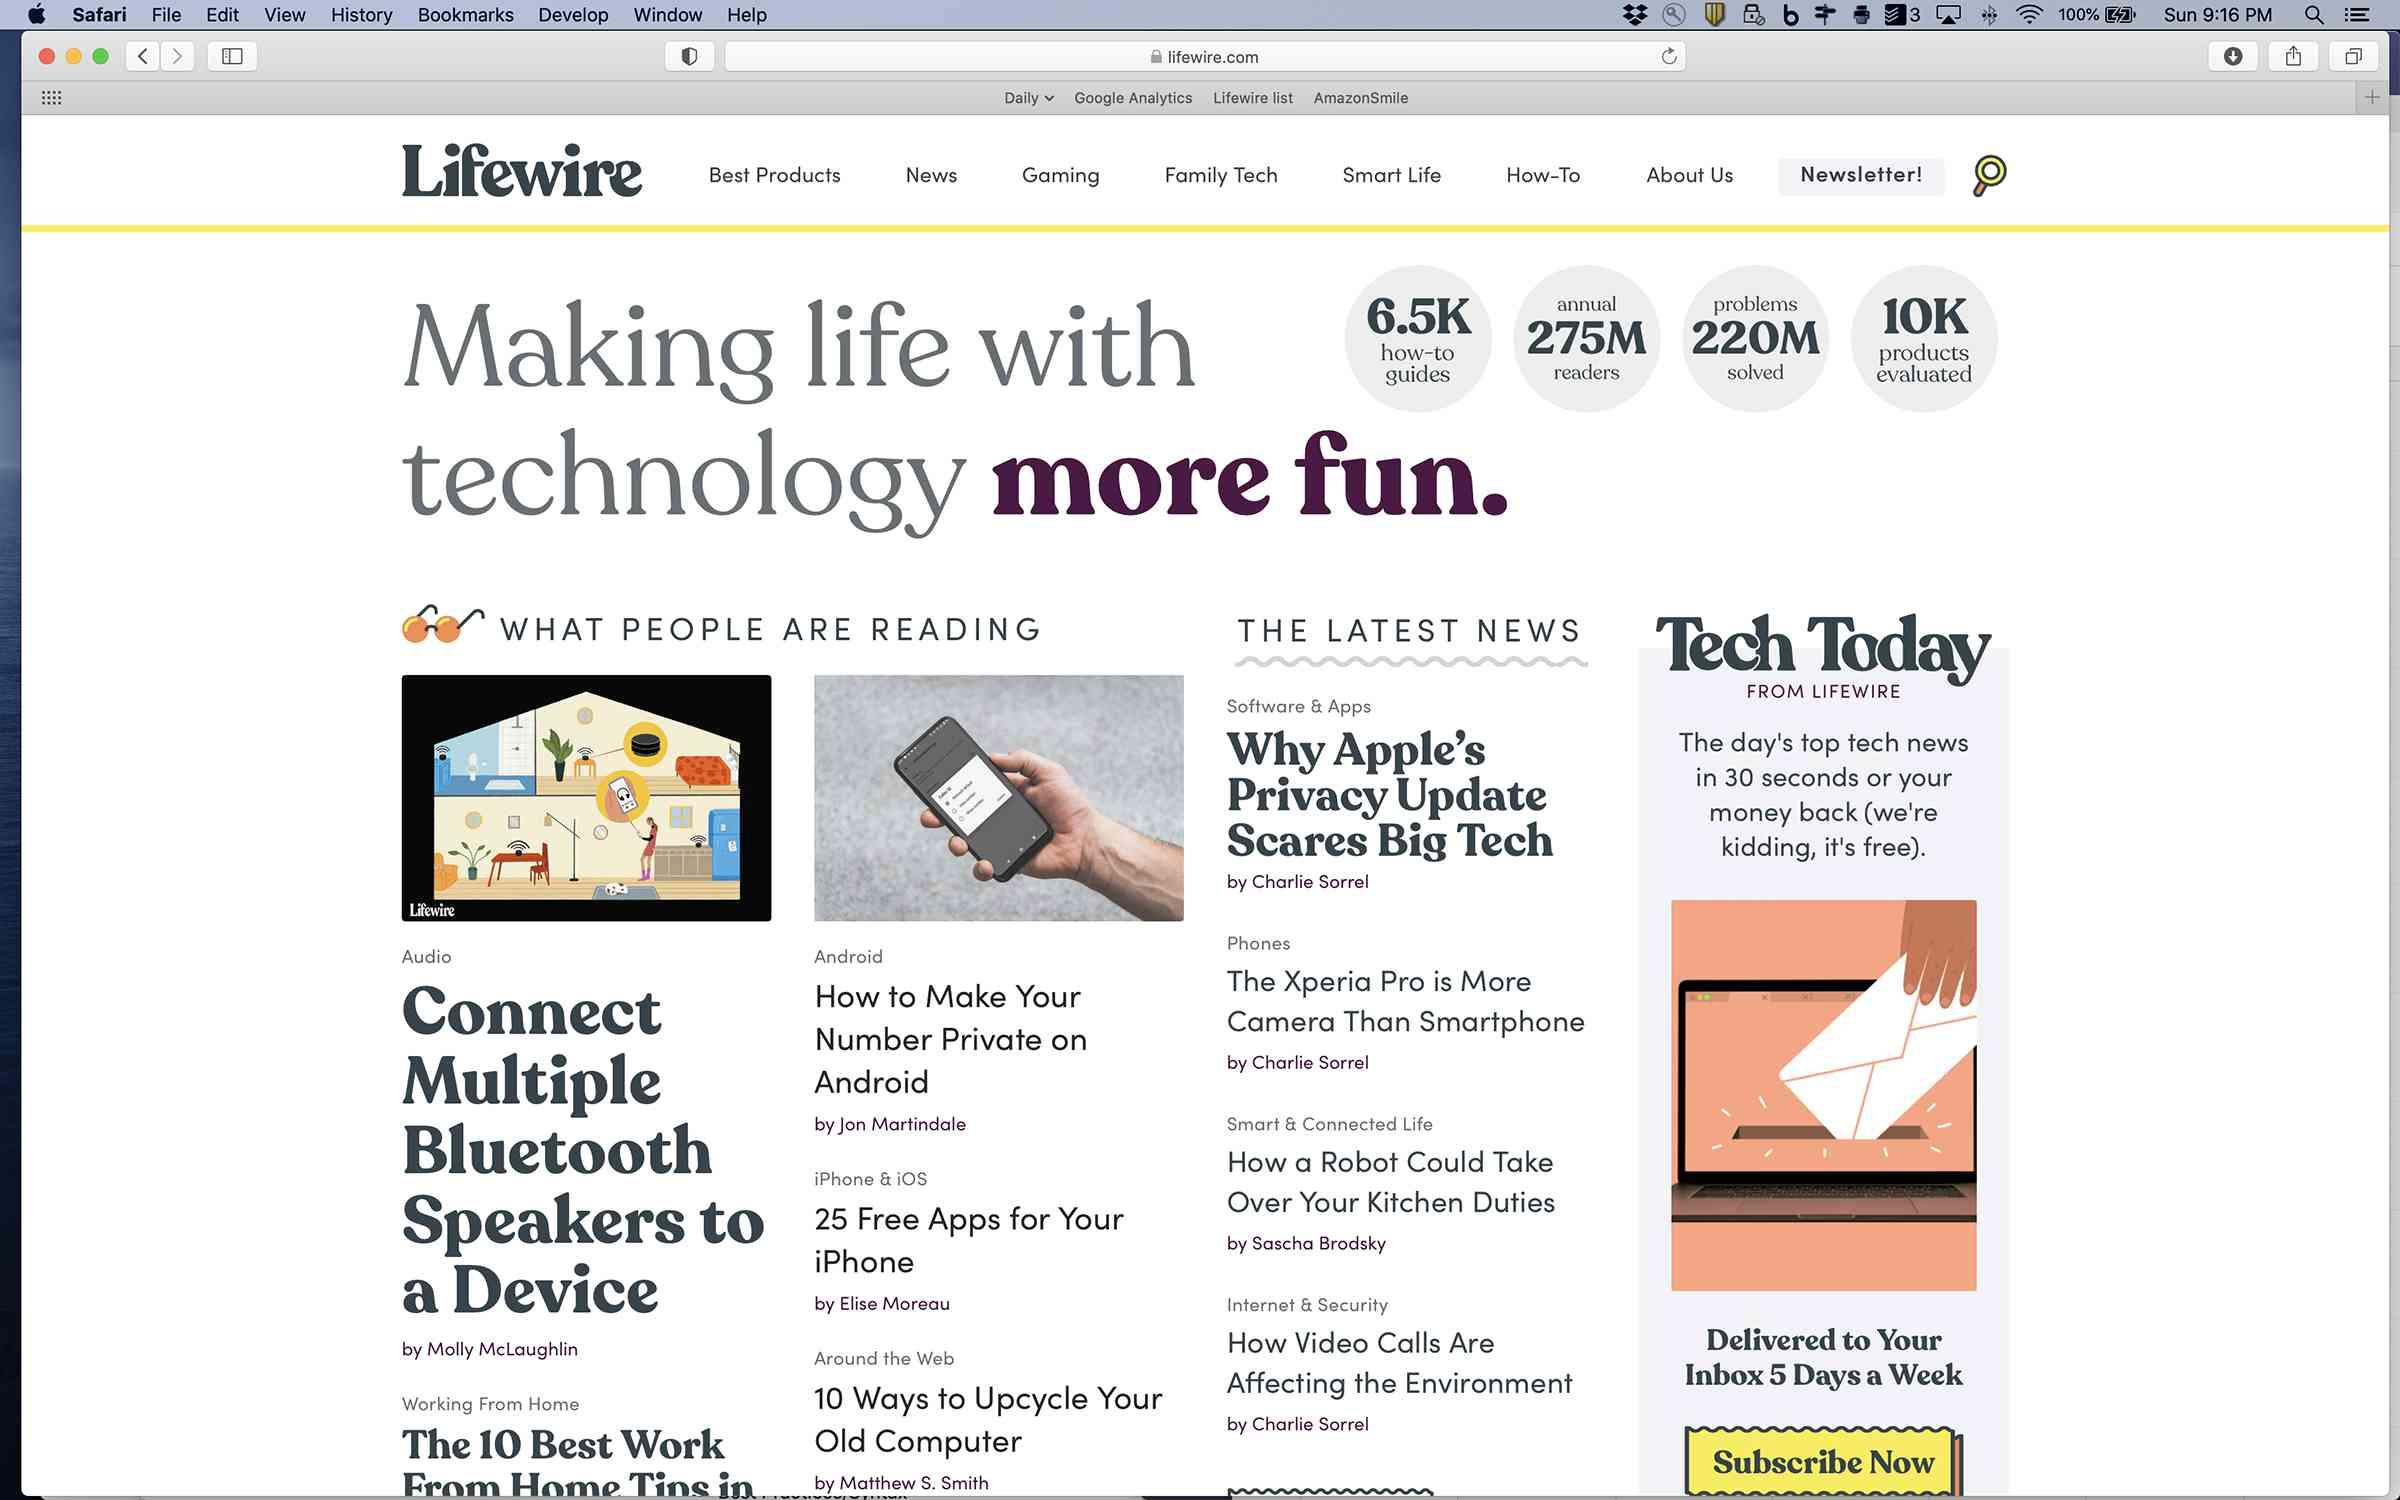 A screenshot of the Safari web browser